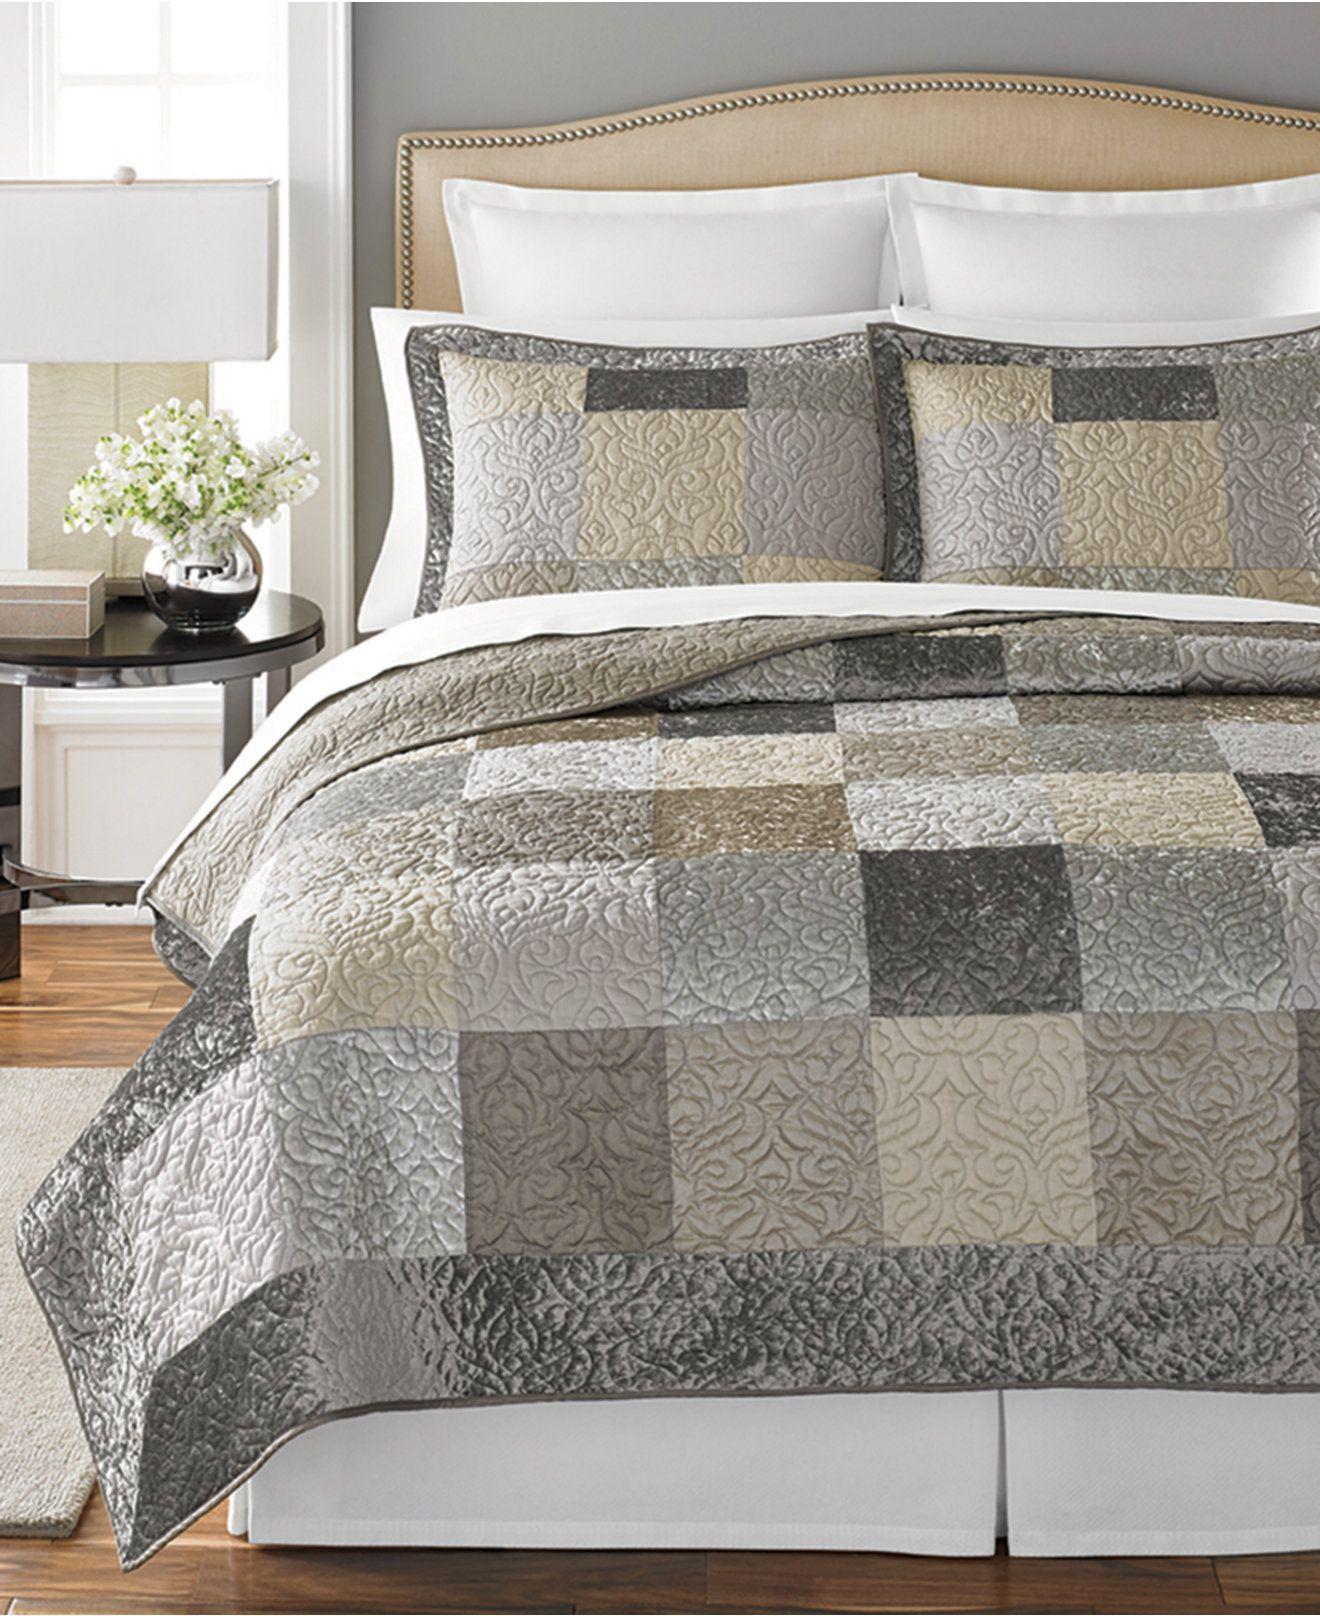 grey & beige quilts - Google Search   *Must Print   Pinterest ... : beige quilts - Adamdwight.com